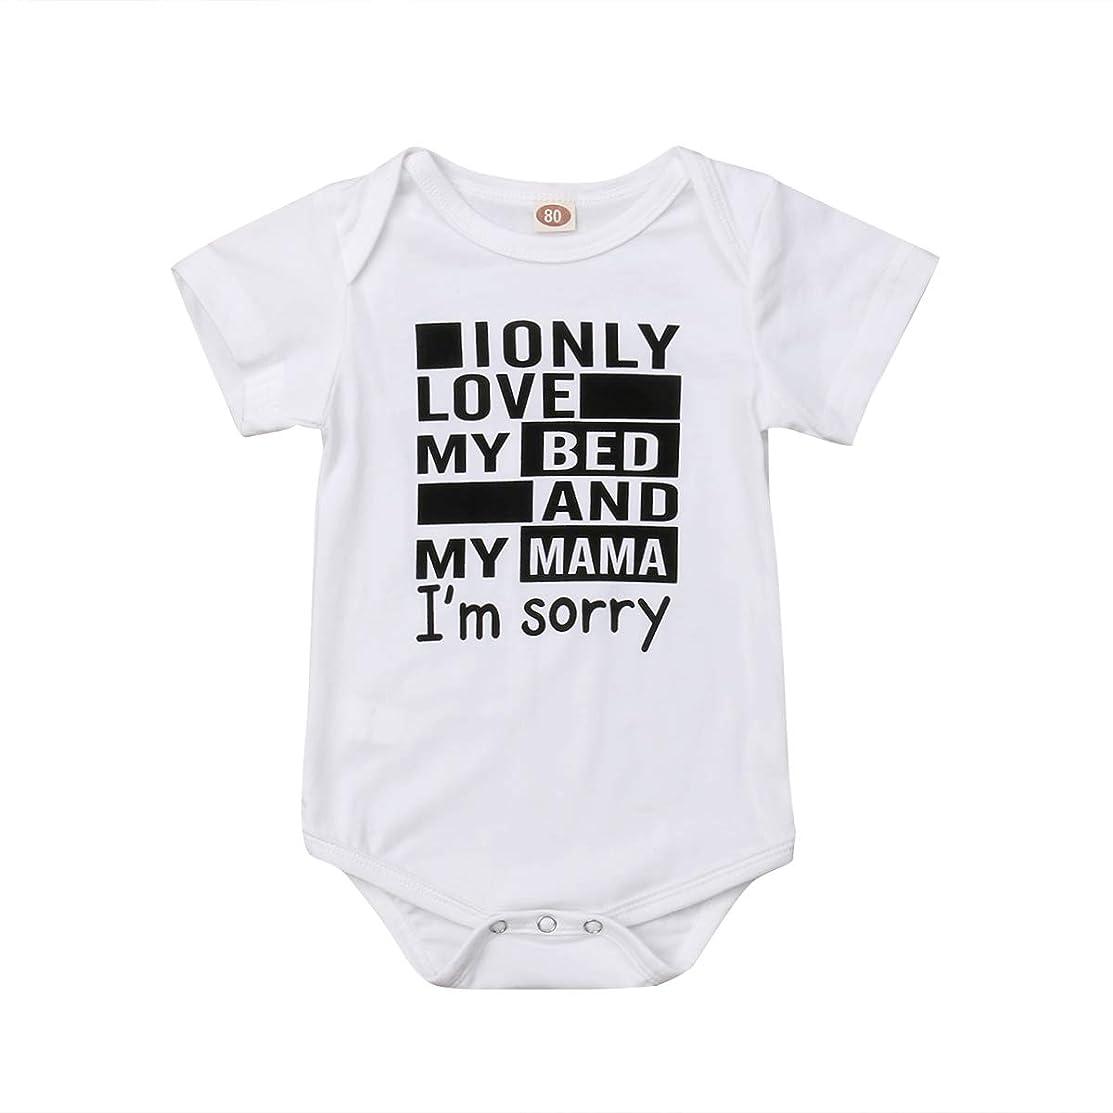 Gobrillant Infant Baby Girl Boy Clothes Short Sleeve Romper Jumpsuit Bodysuit Outfits Costume